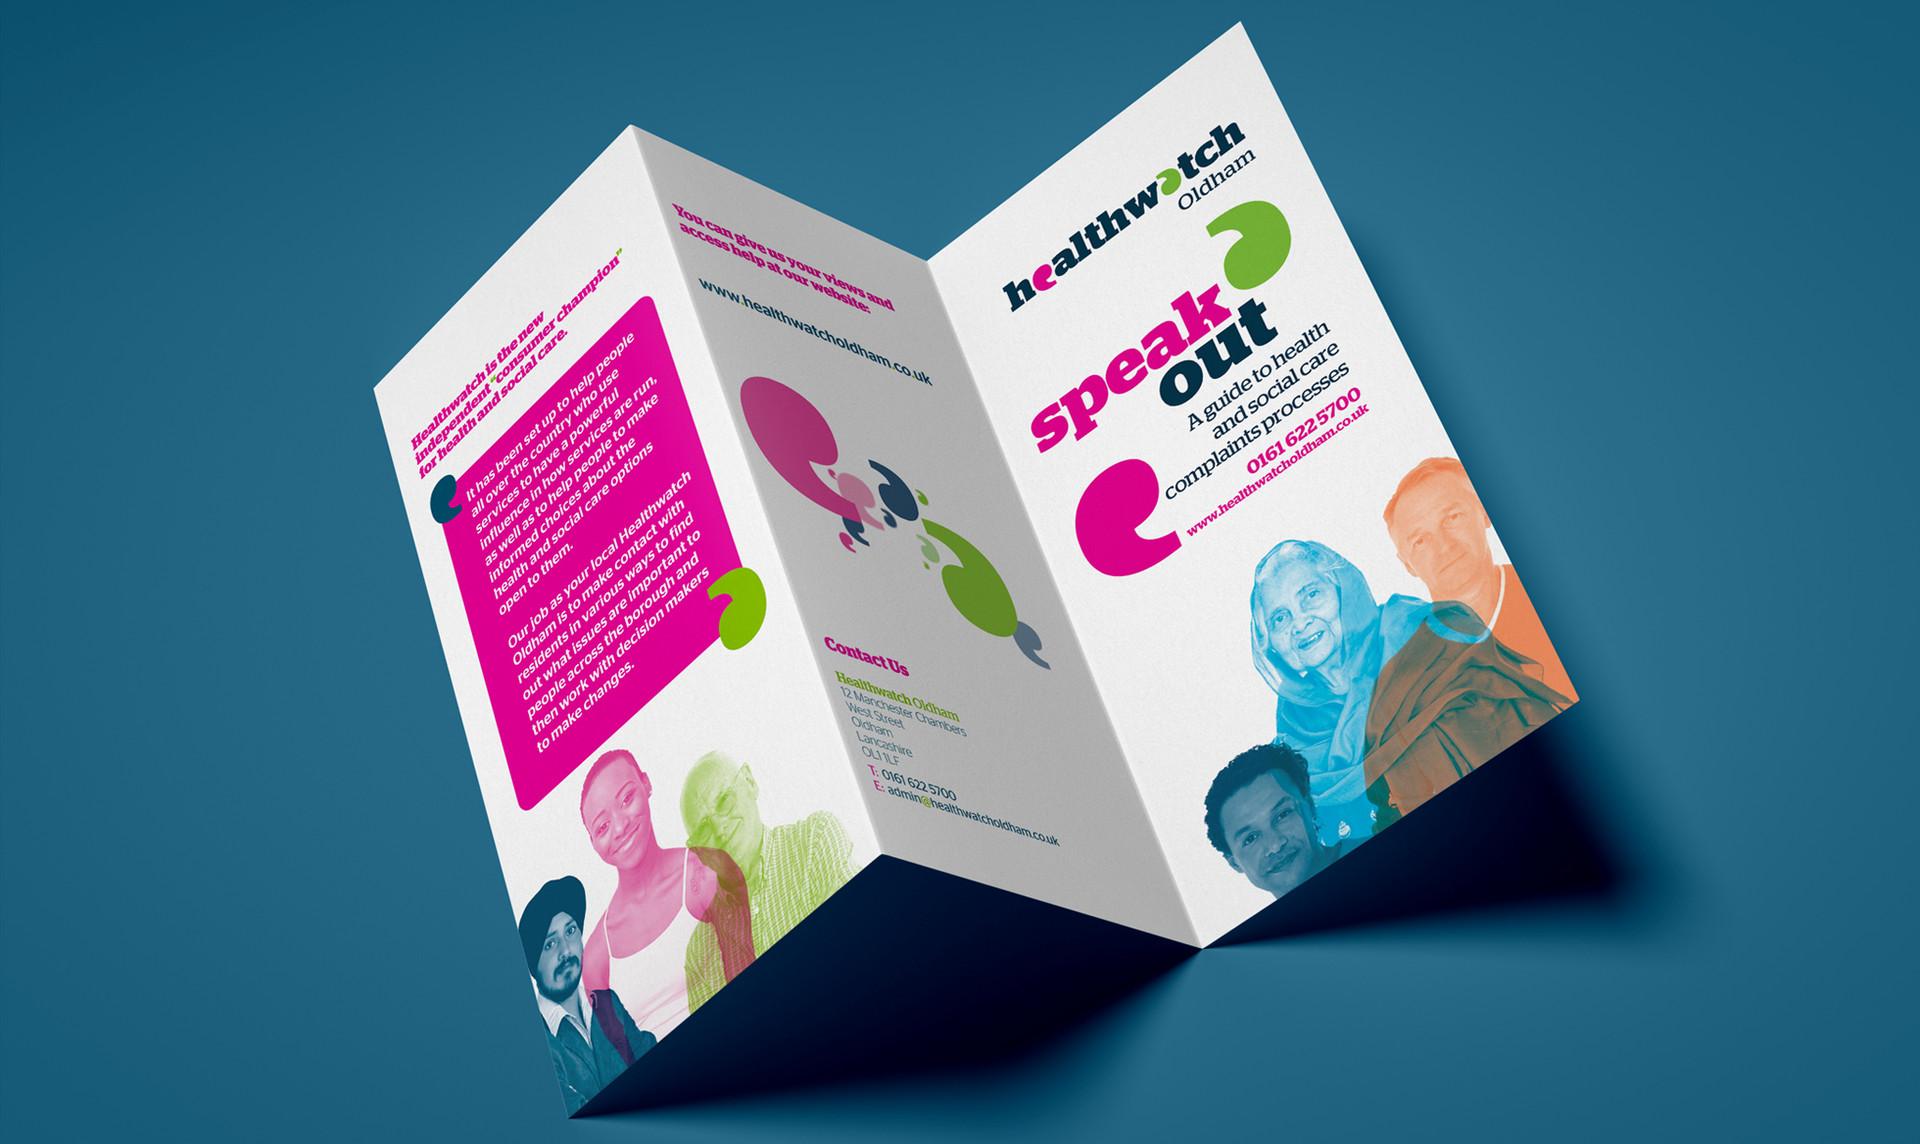 Healthwatch Trifold Leaflet Design